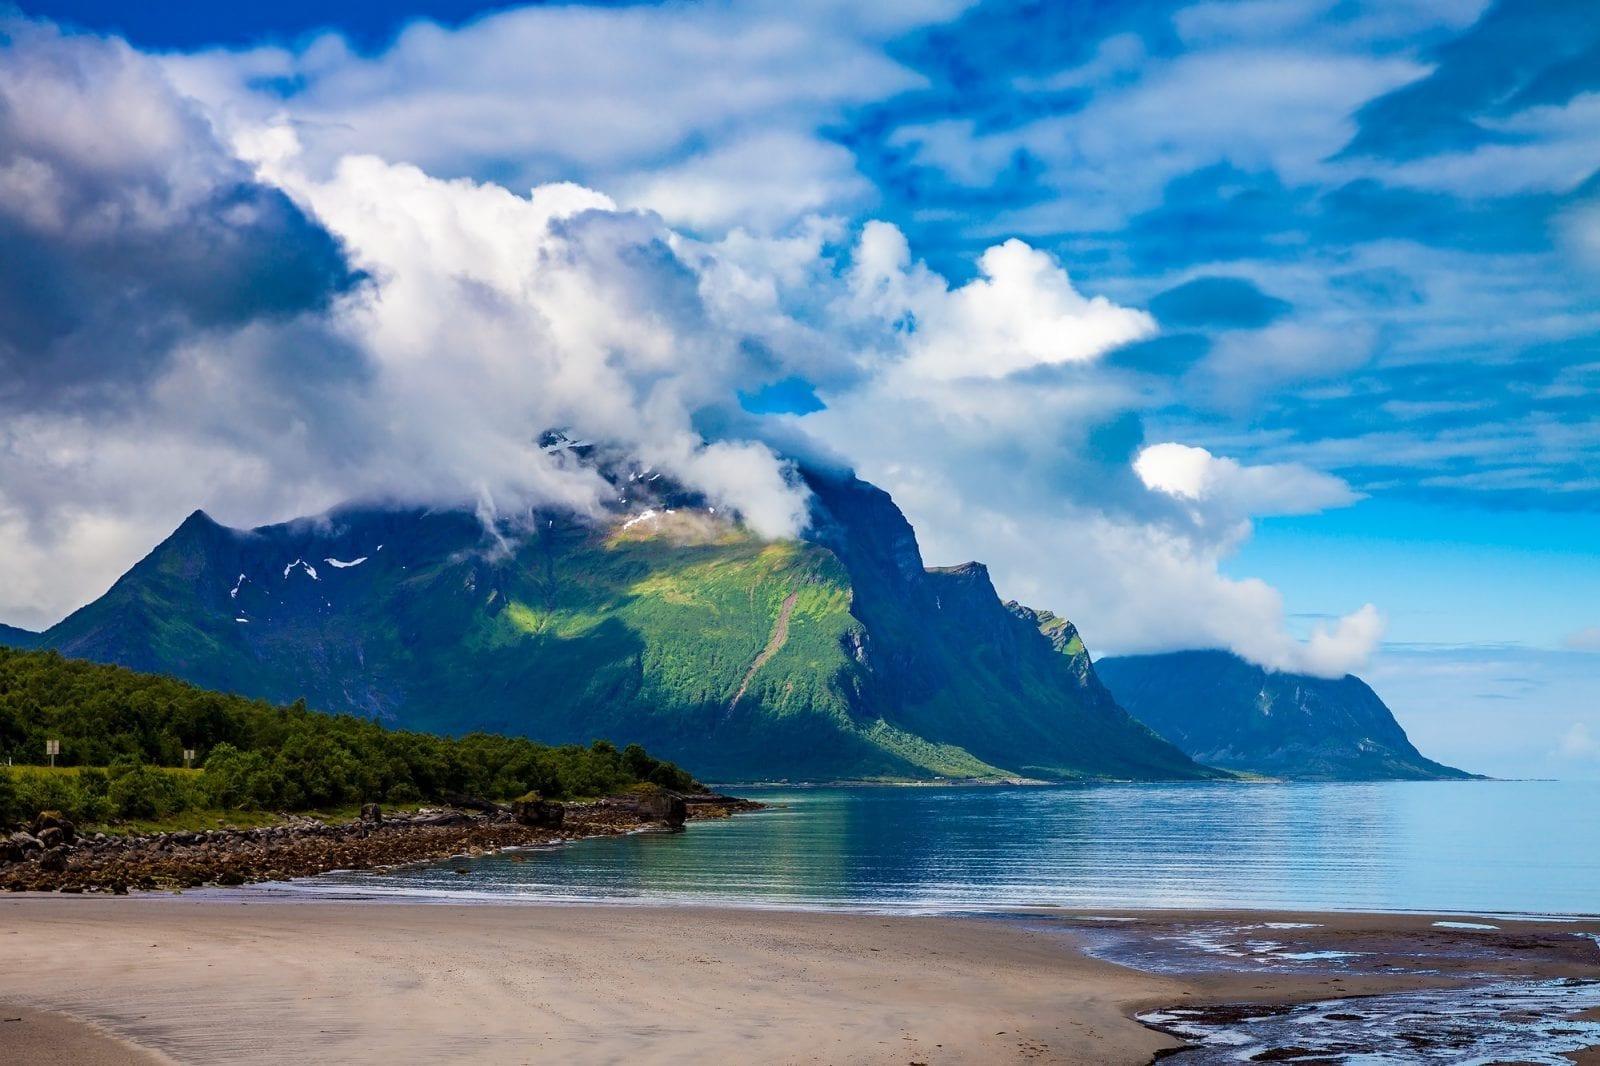 Mountain and Sea landscape